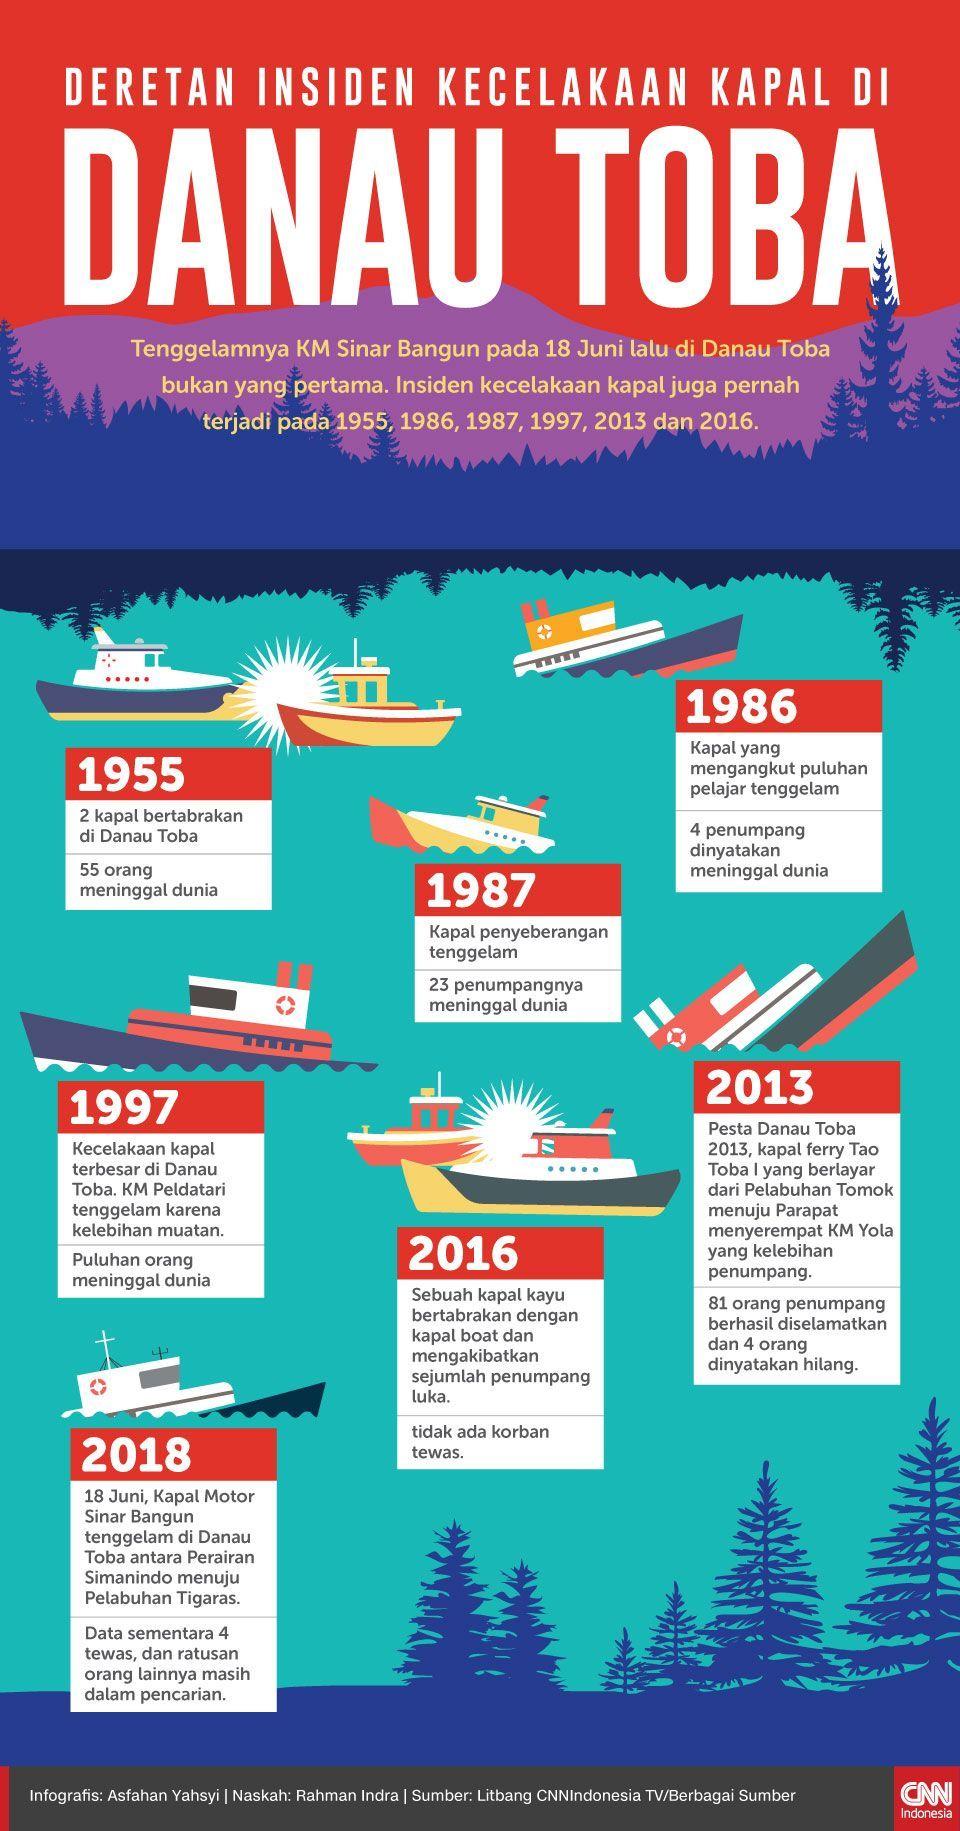 Infografis Deretan Insiden Kecelakaan Kapal di Danau Toba